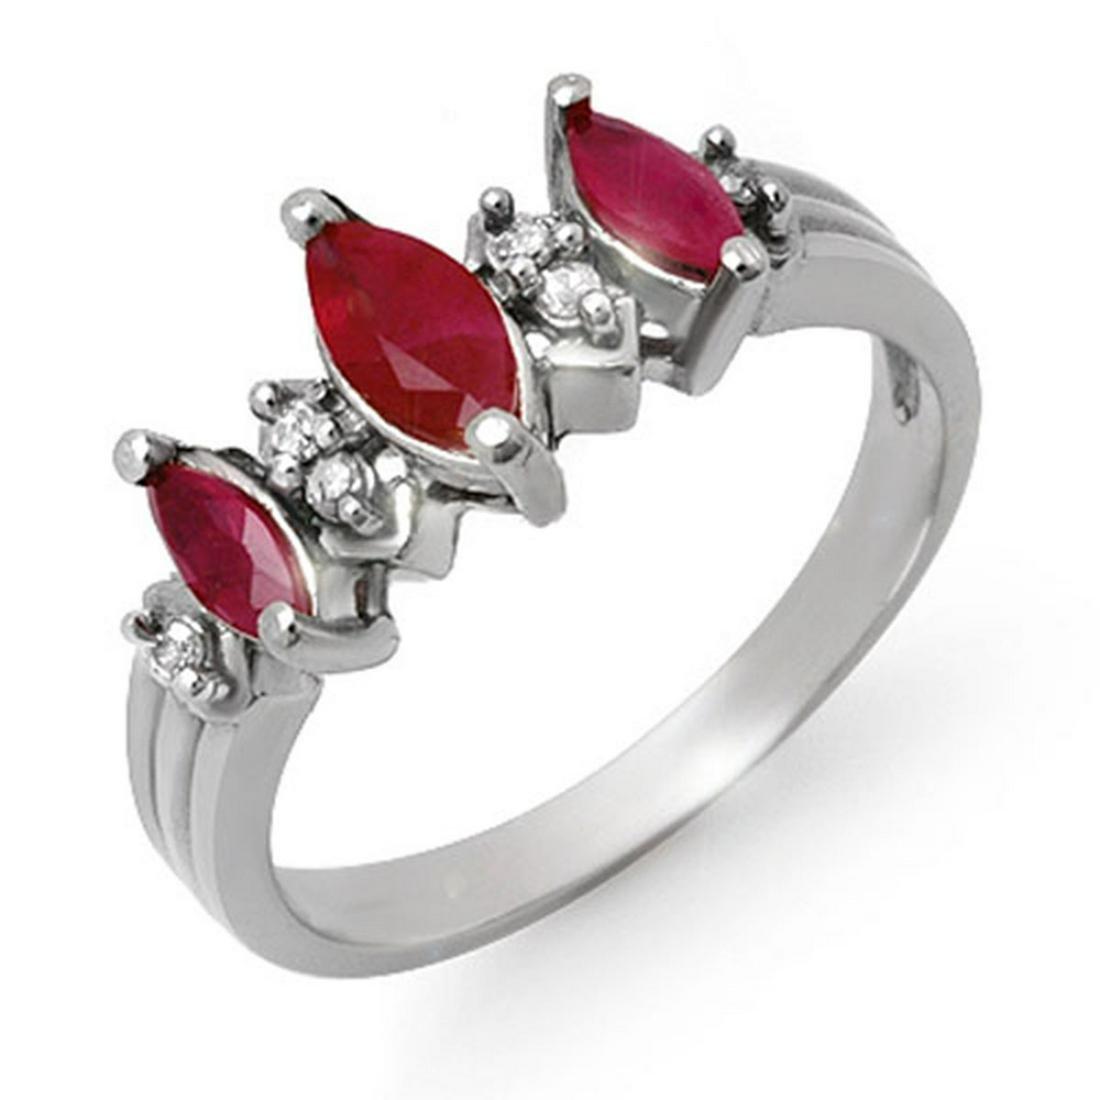 1.0 ctw Ruby & Diamond Ring 18K White Gold - REF-37N8A